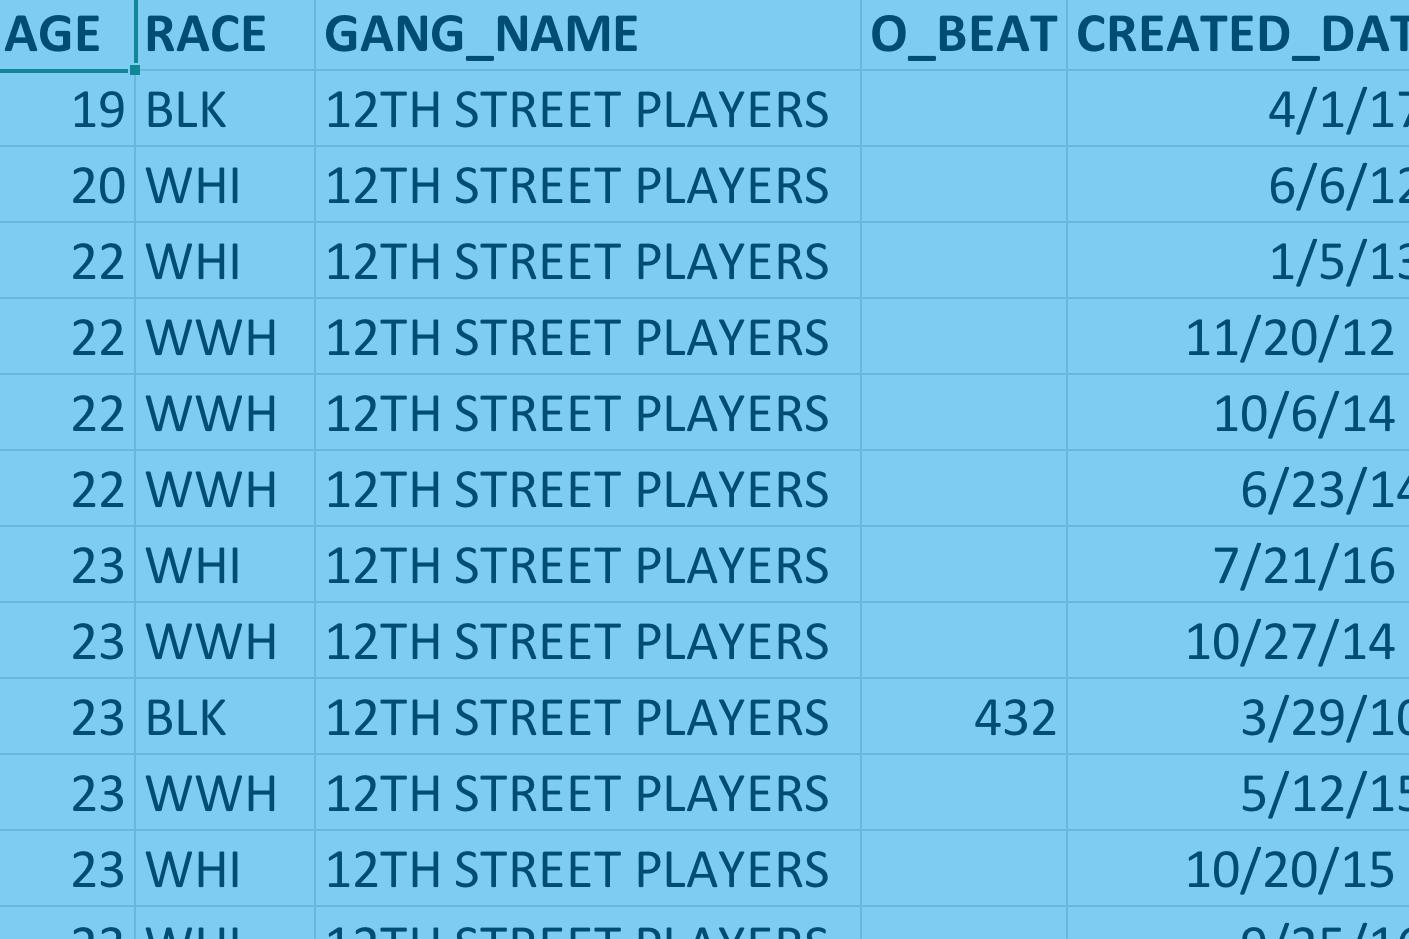 CPD Gang Database